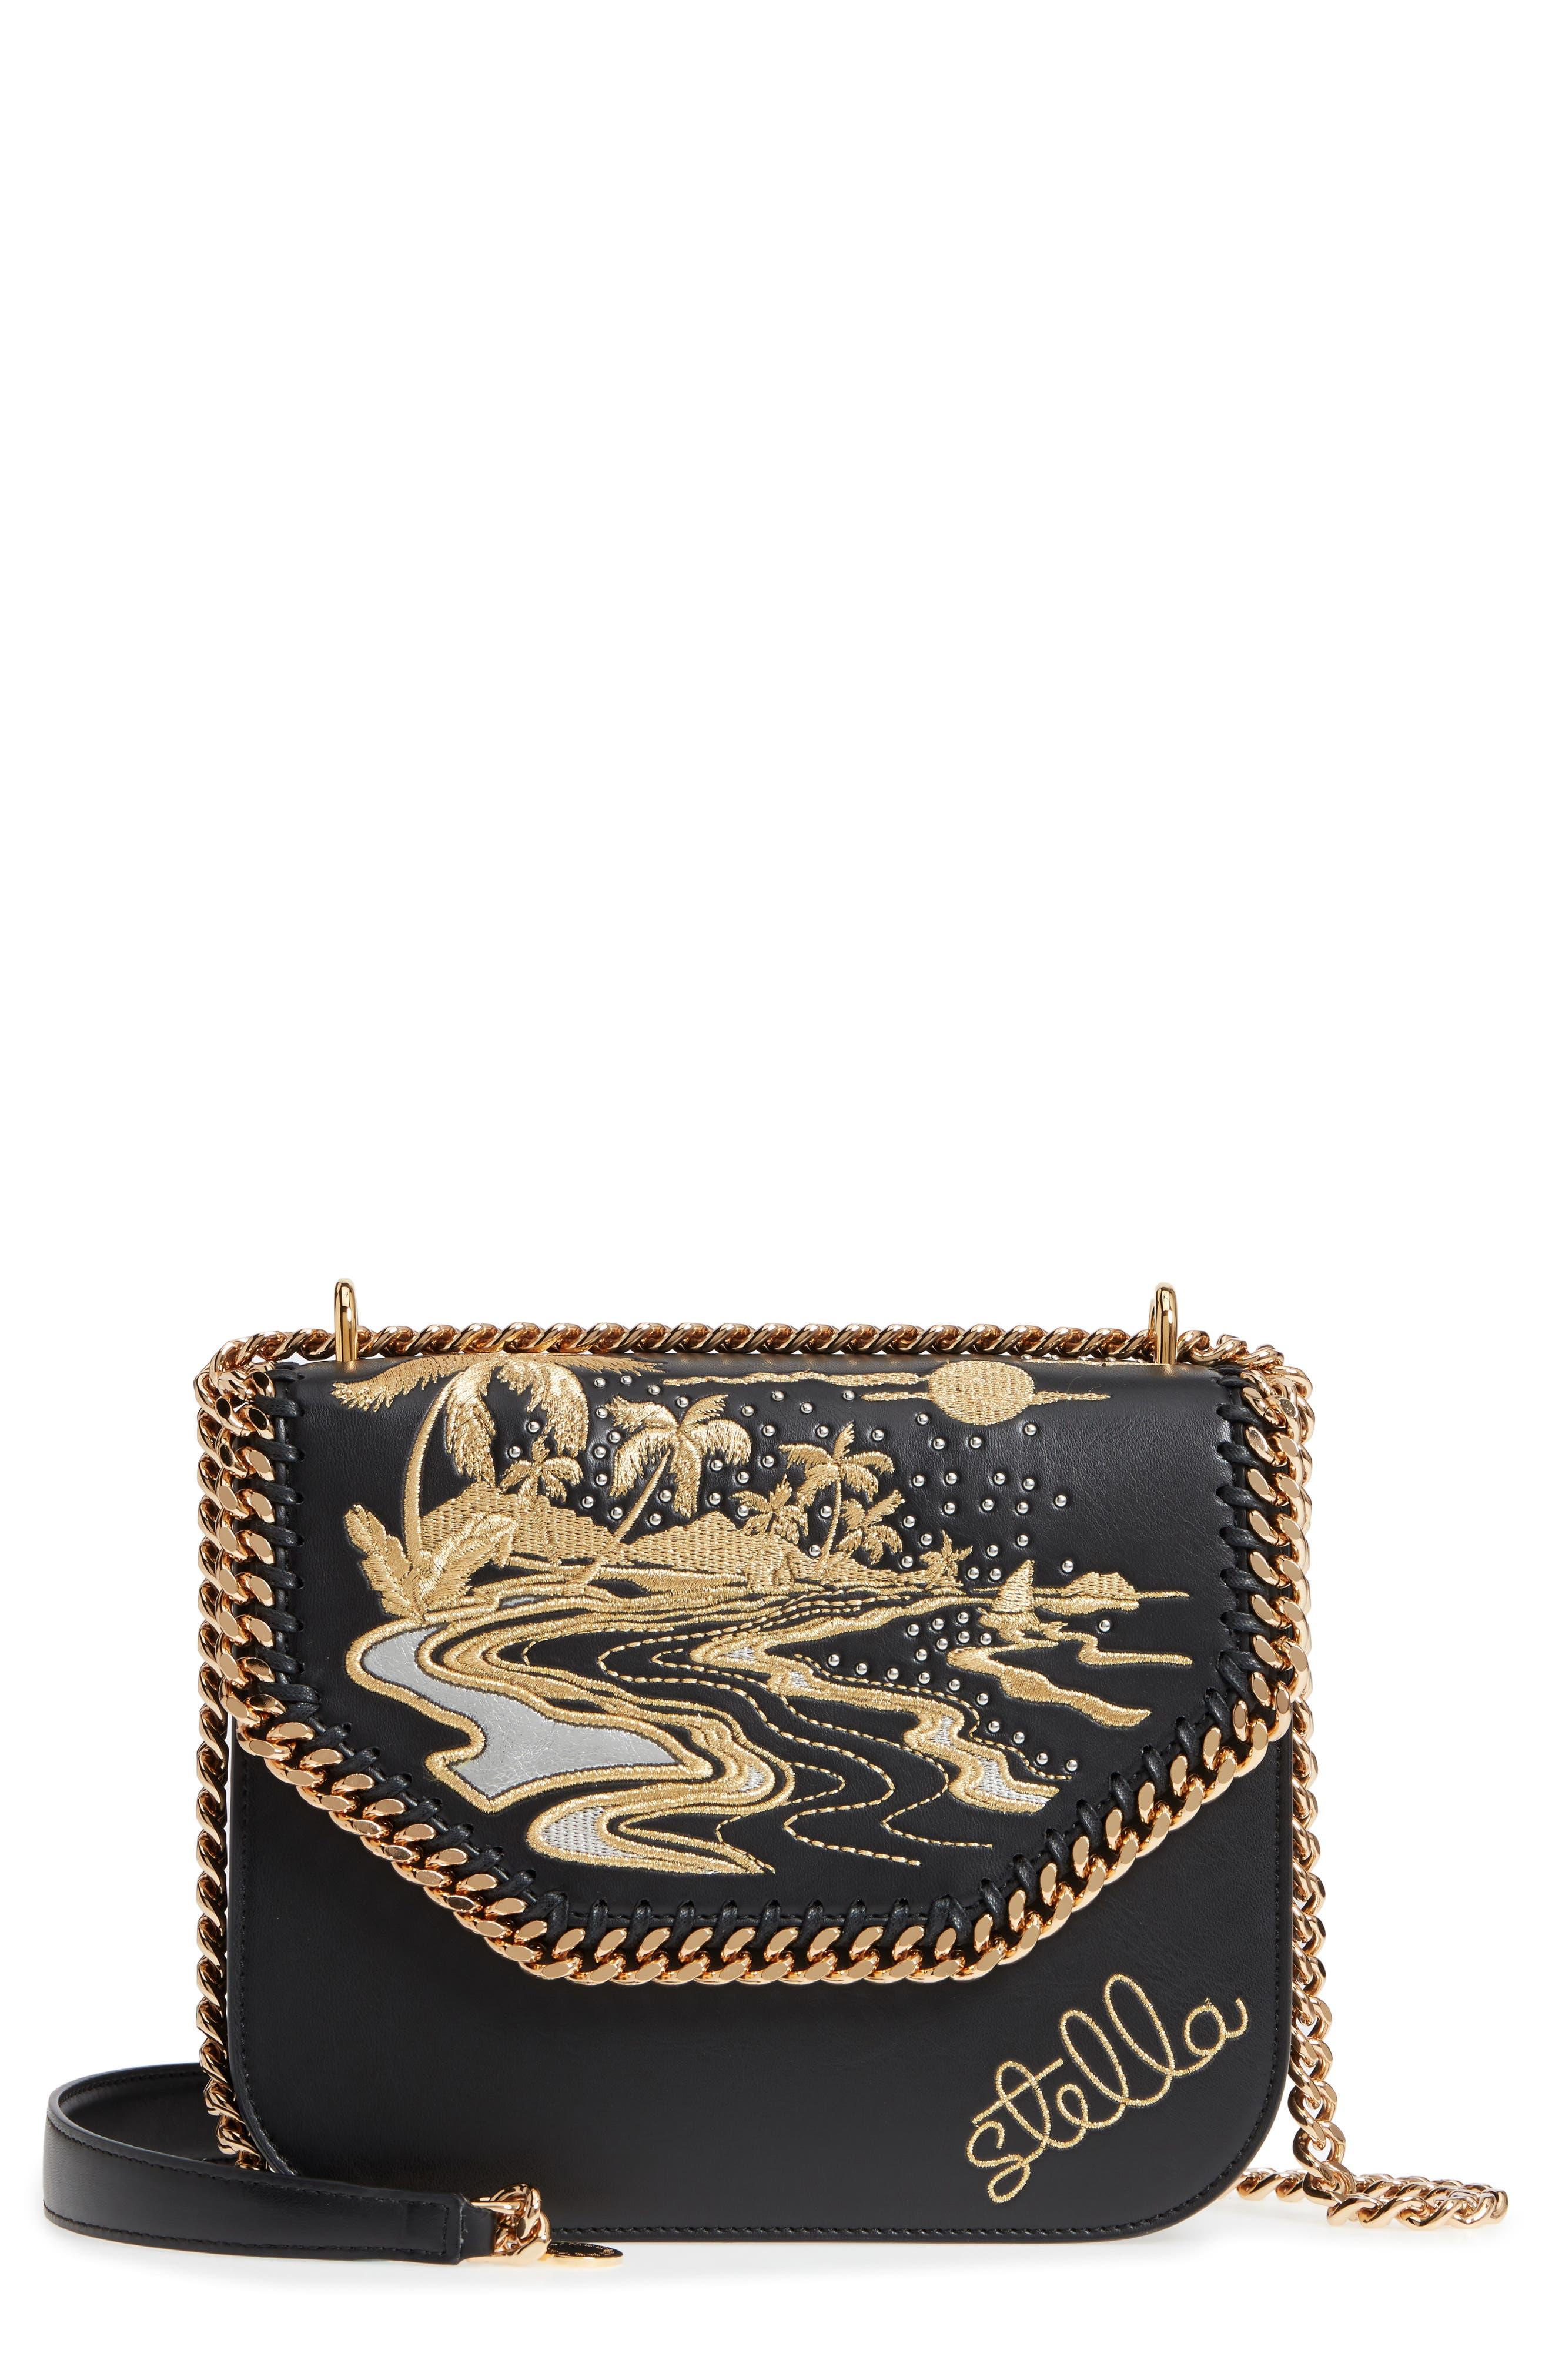 Stella McCartney Falabella Hawaiian Embroidered Faux Leather Shoulder Bag